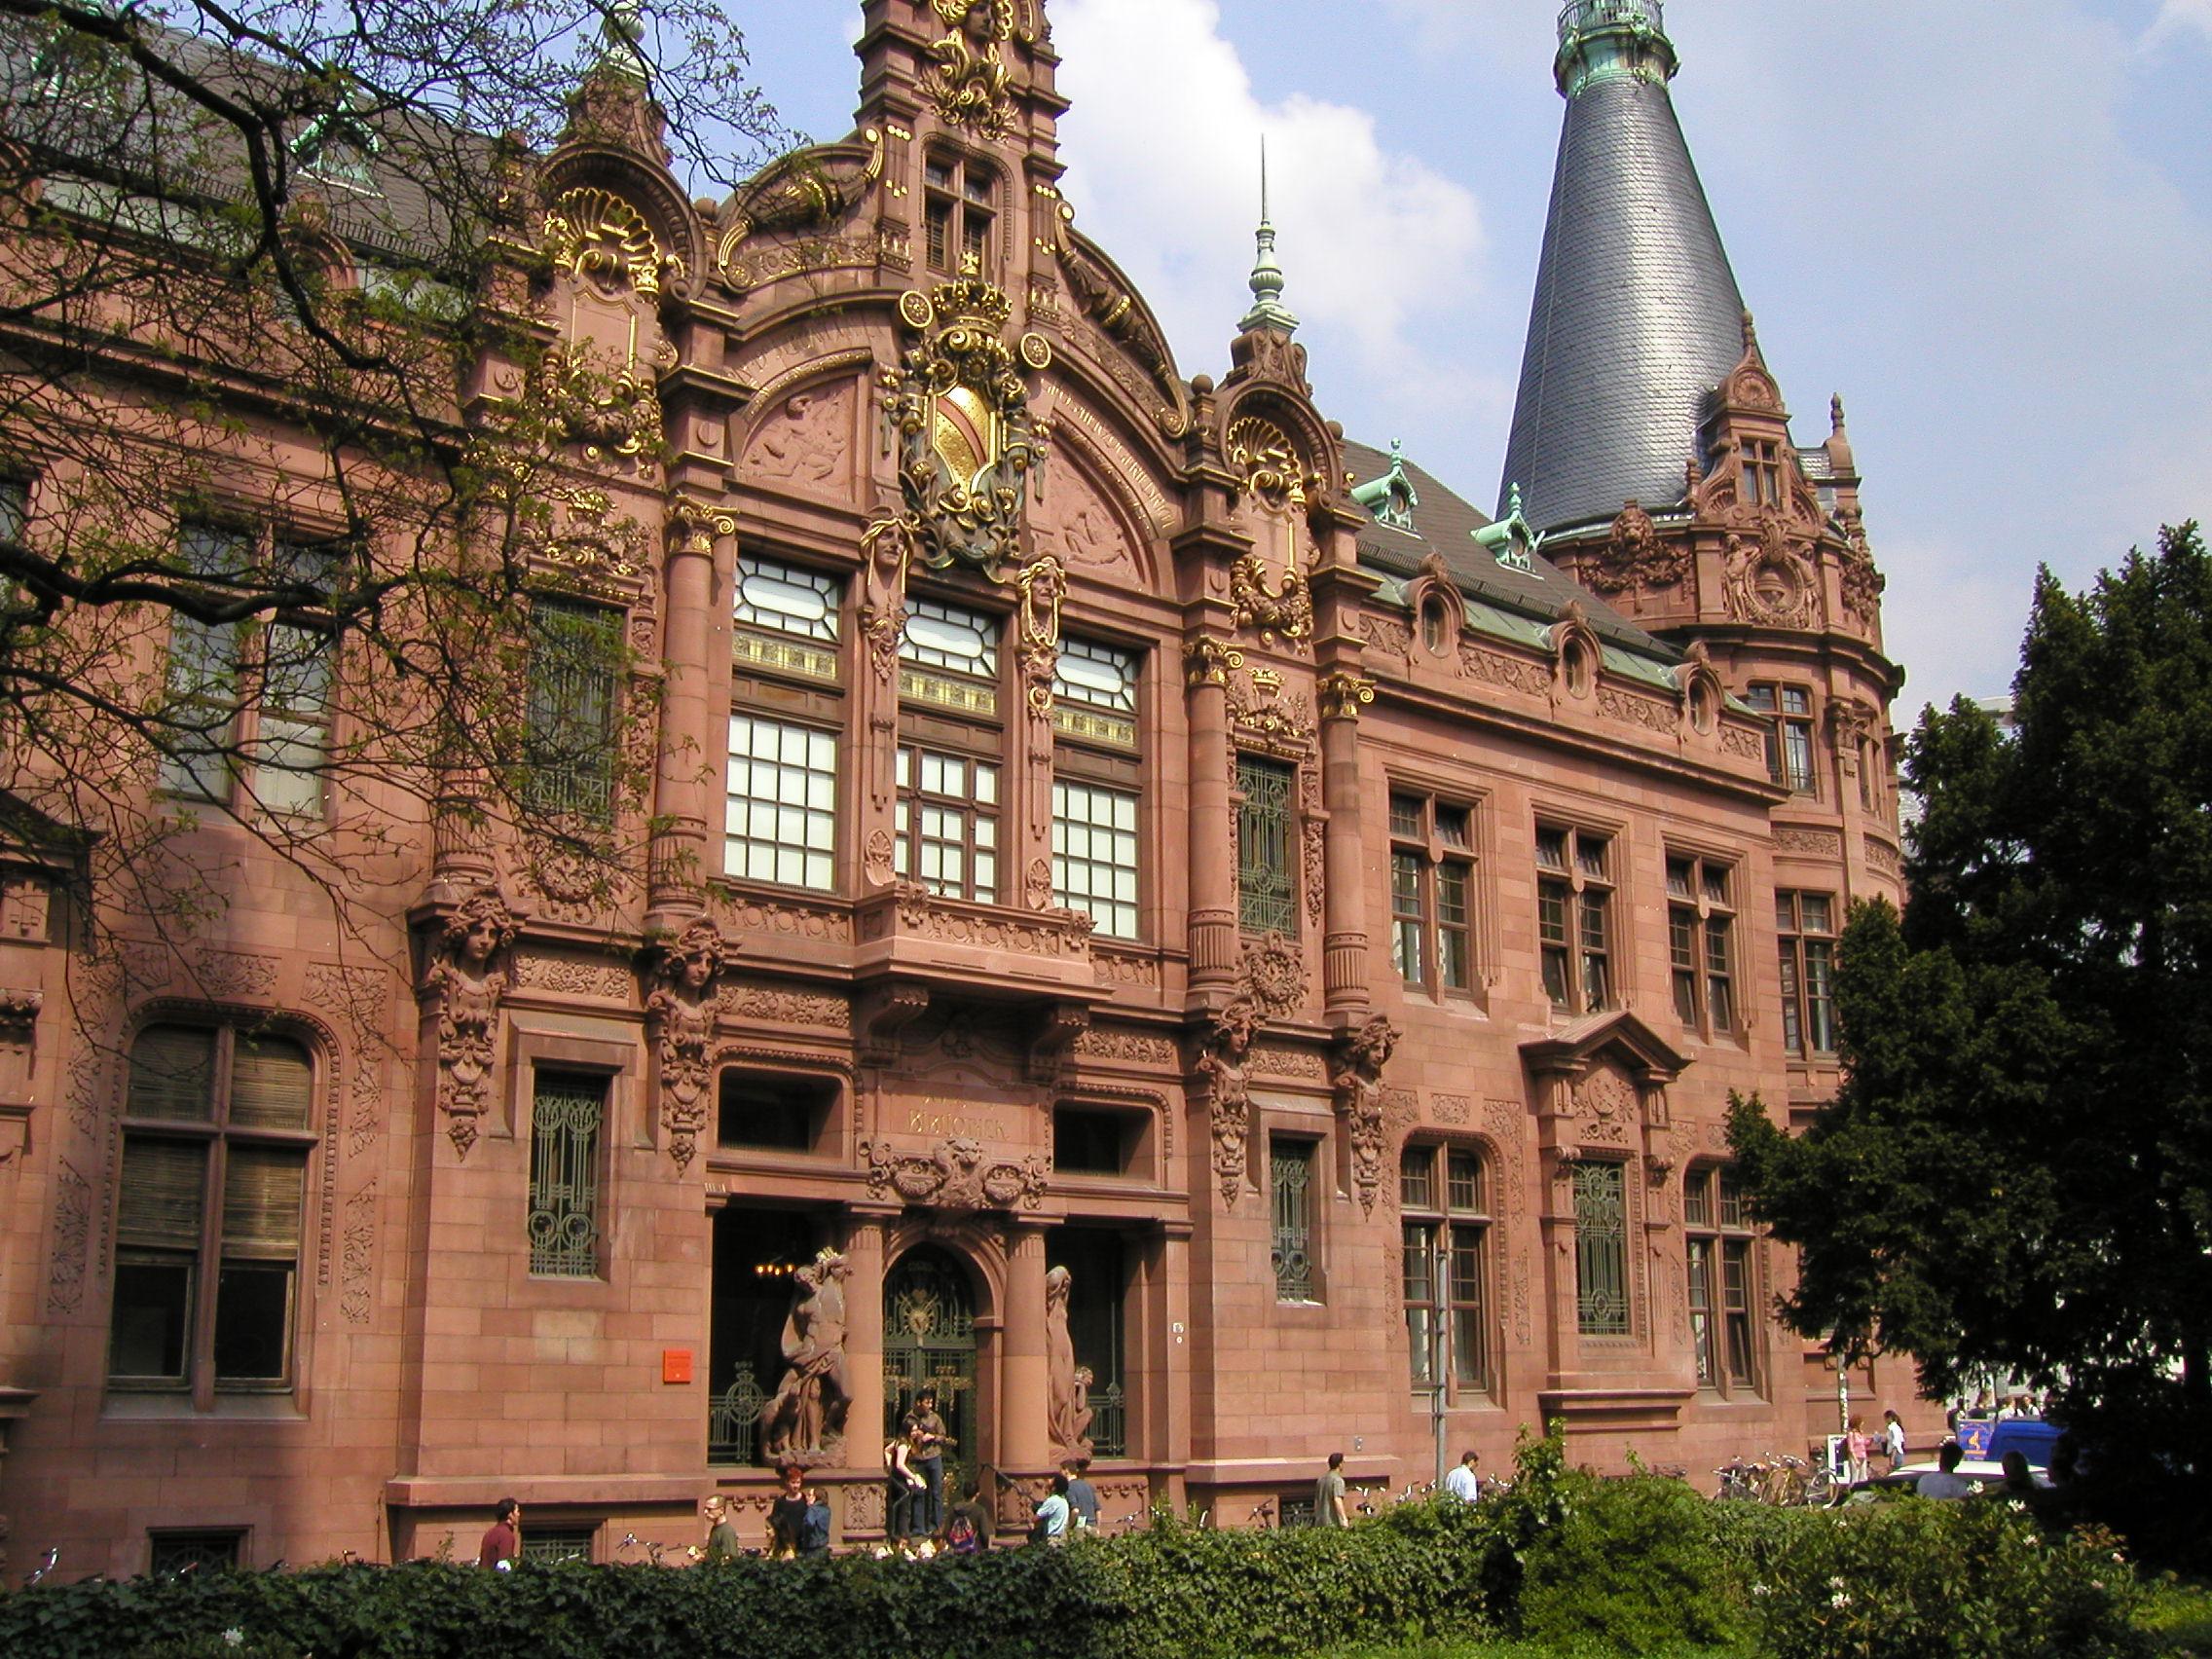 The main humanities library at Heidelberg, my alma mater